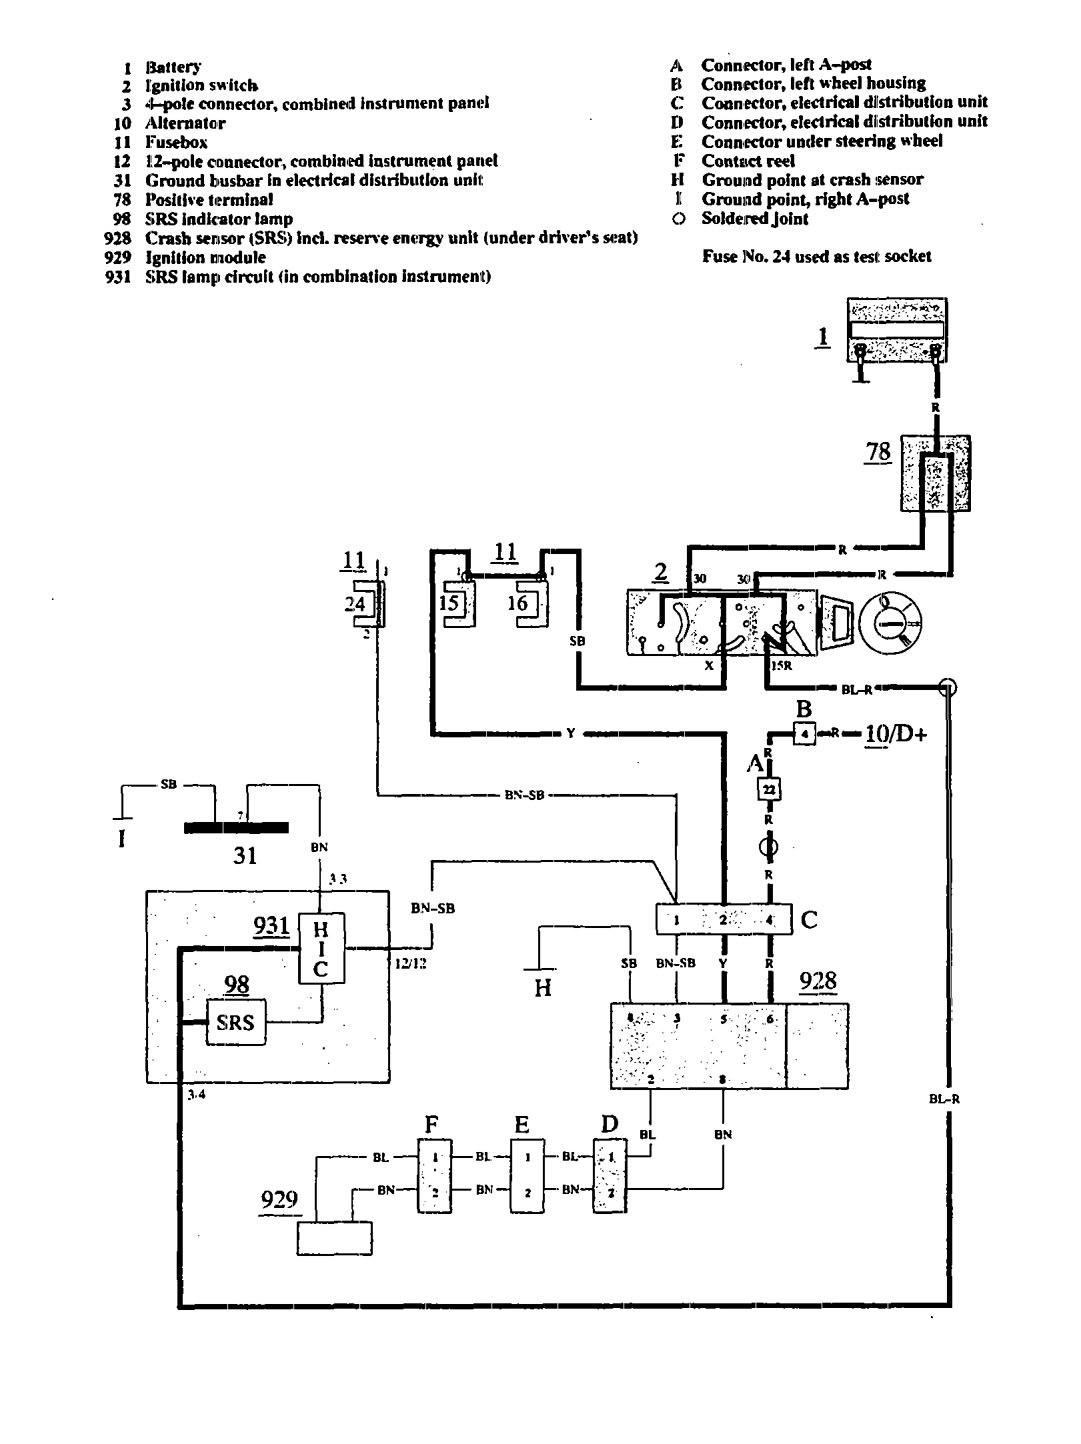 jcb alternator wiring diagram motorhome battery isolator 940 library